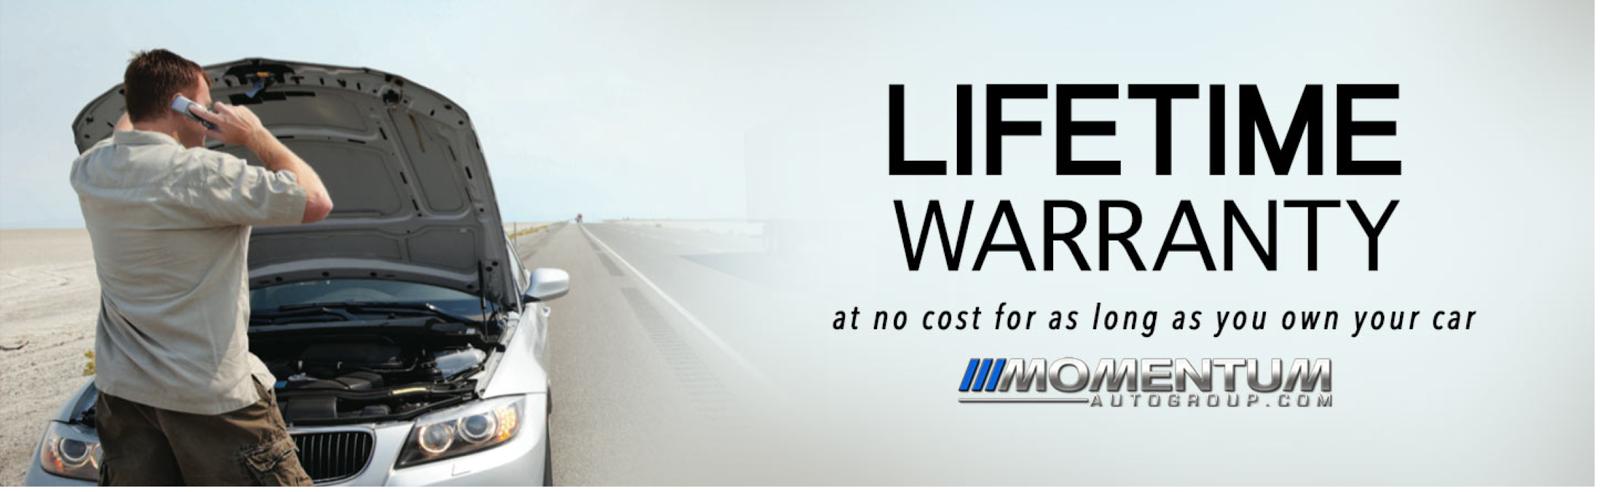 Auto Land Blog Dealership Offers No Cost Lifetime Warranty